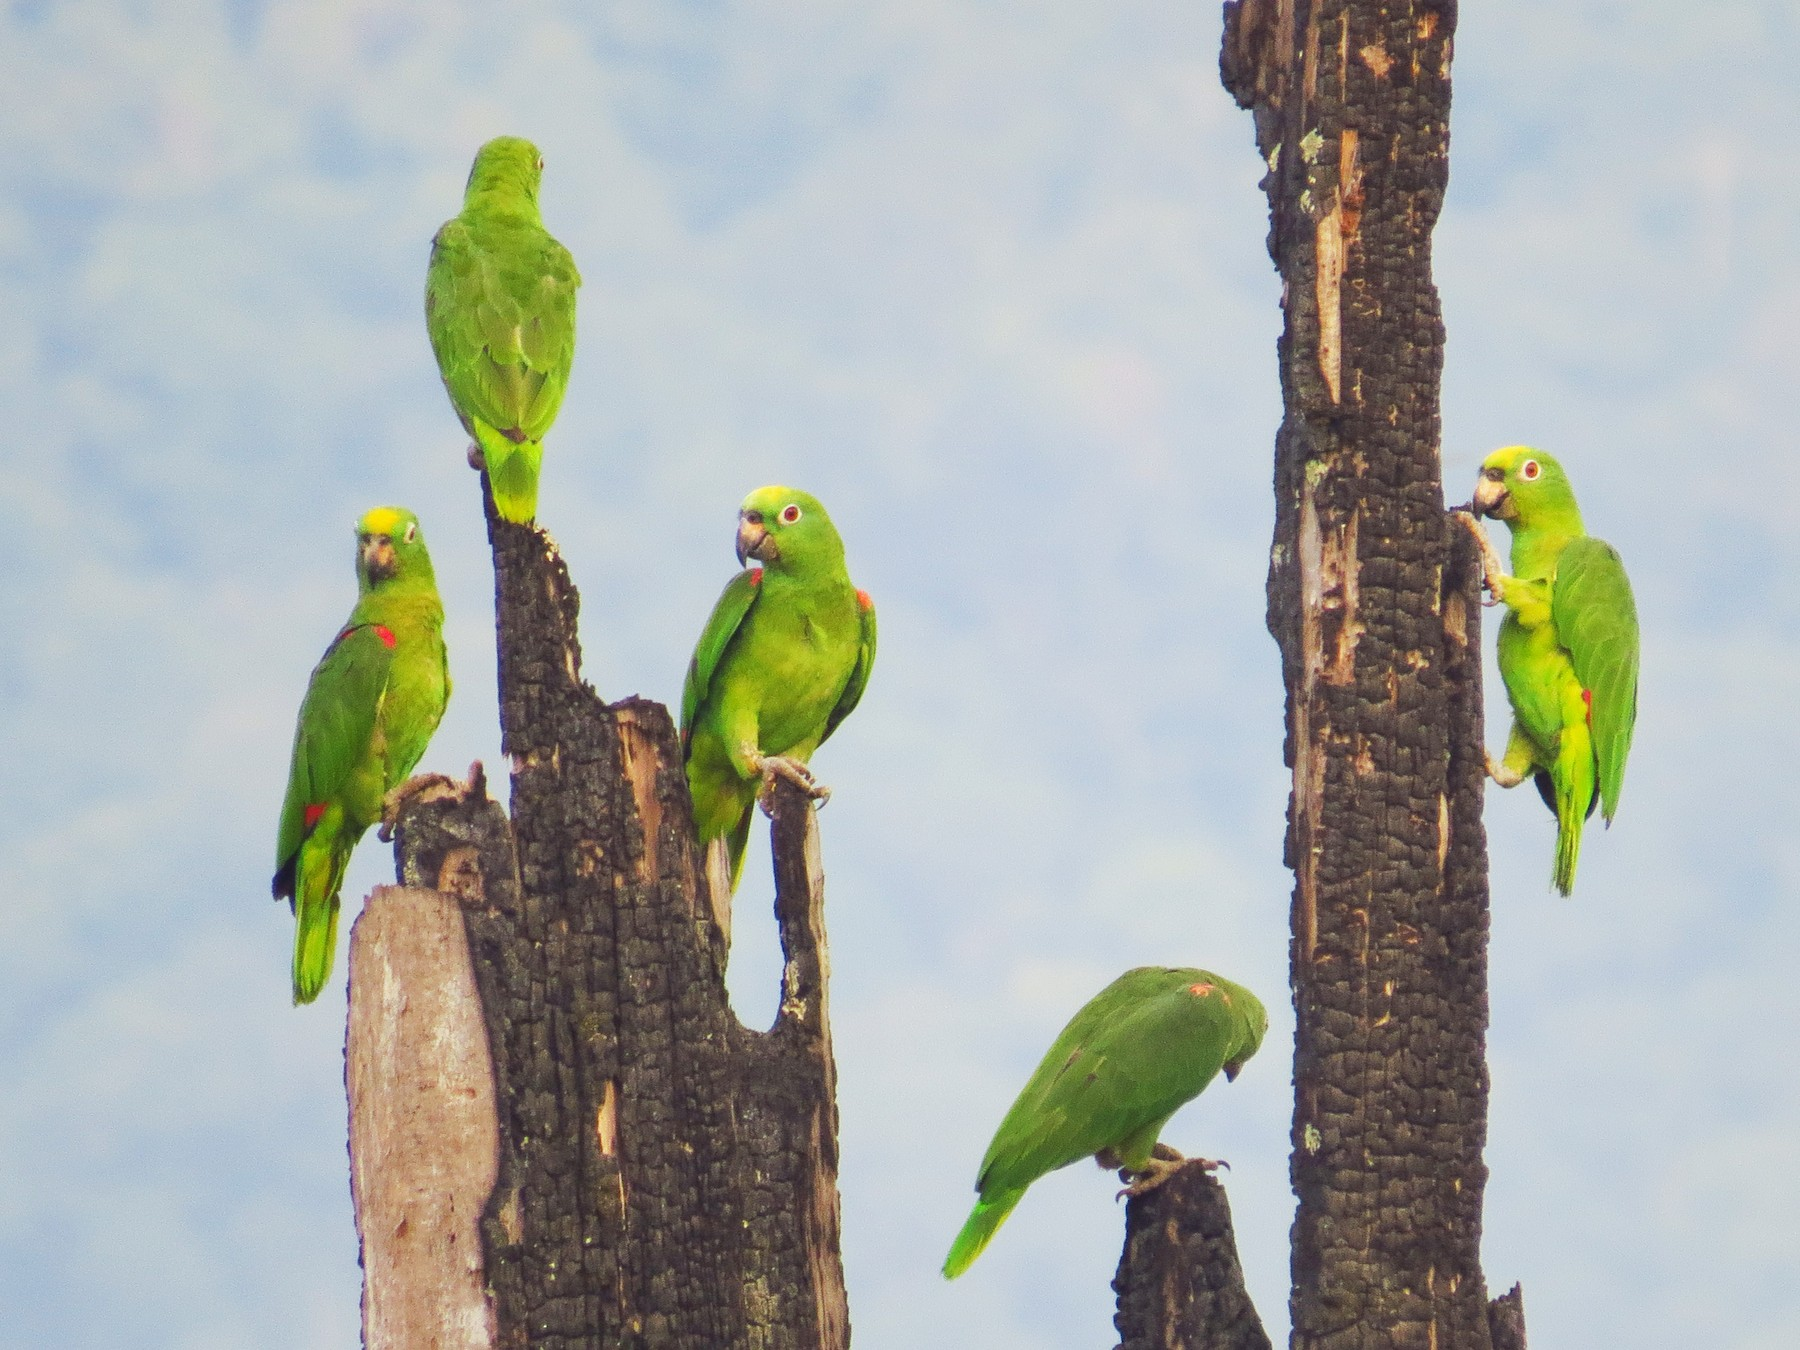 Yellow-crowned Parrot - Jorge Muñoz García   CAQUETA BIRDING